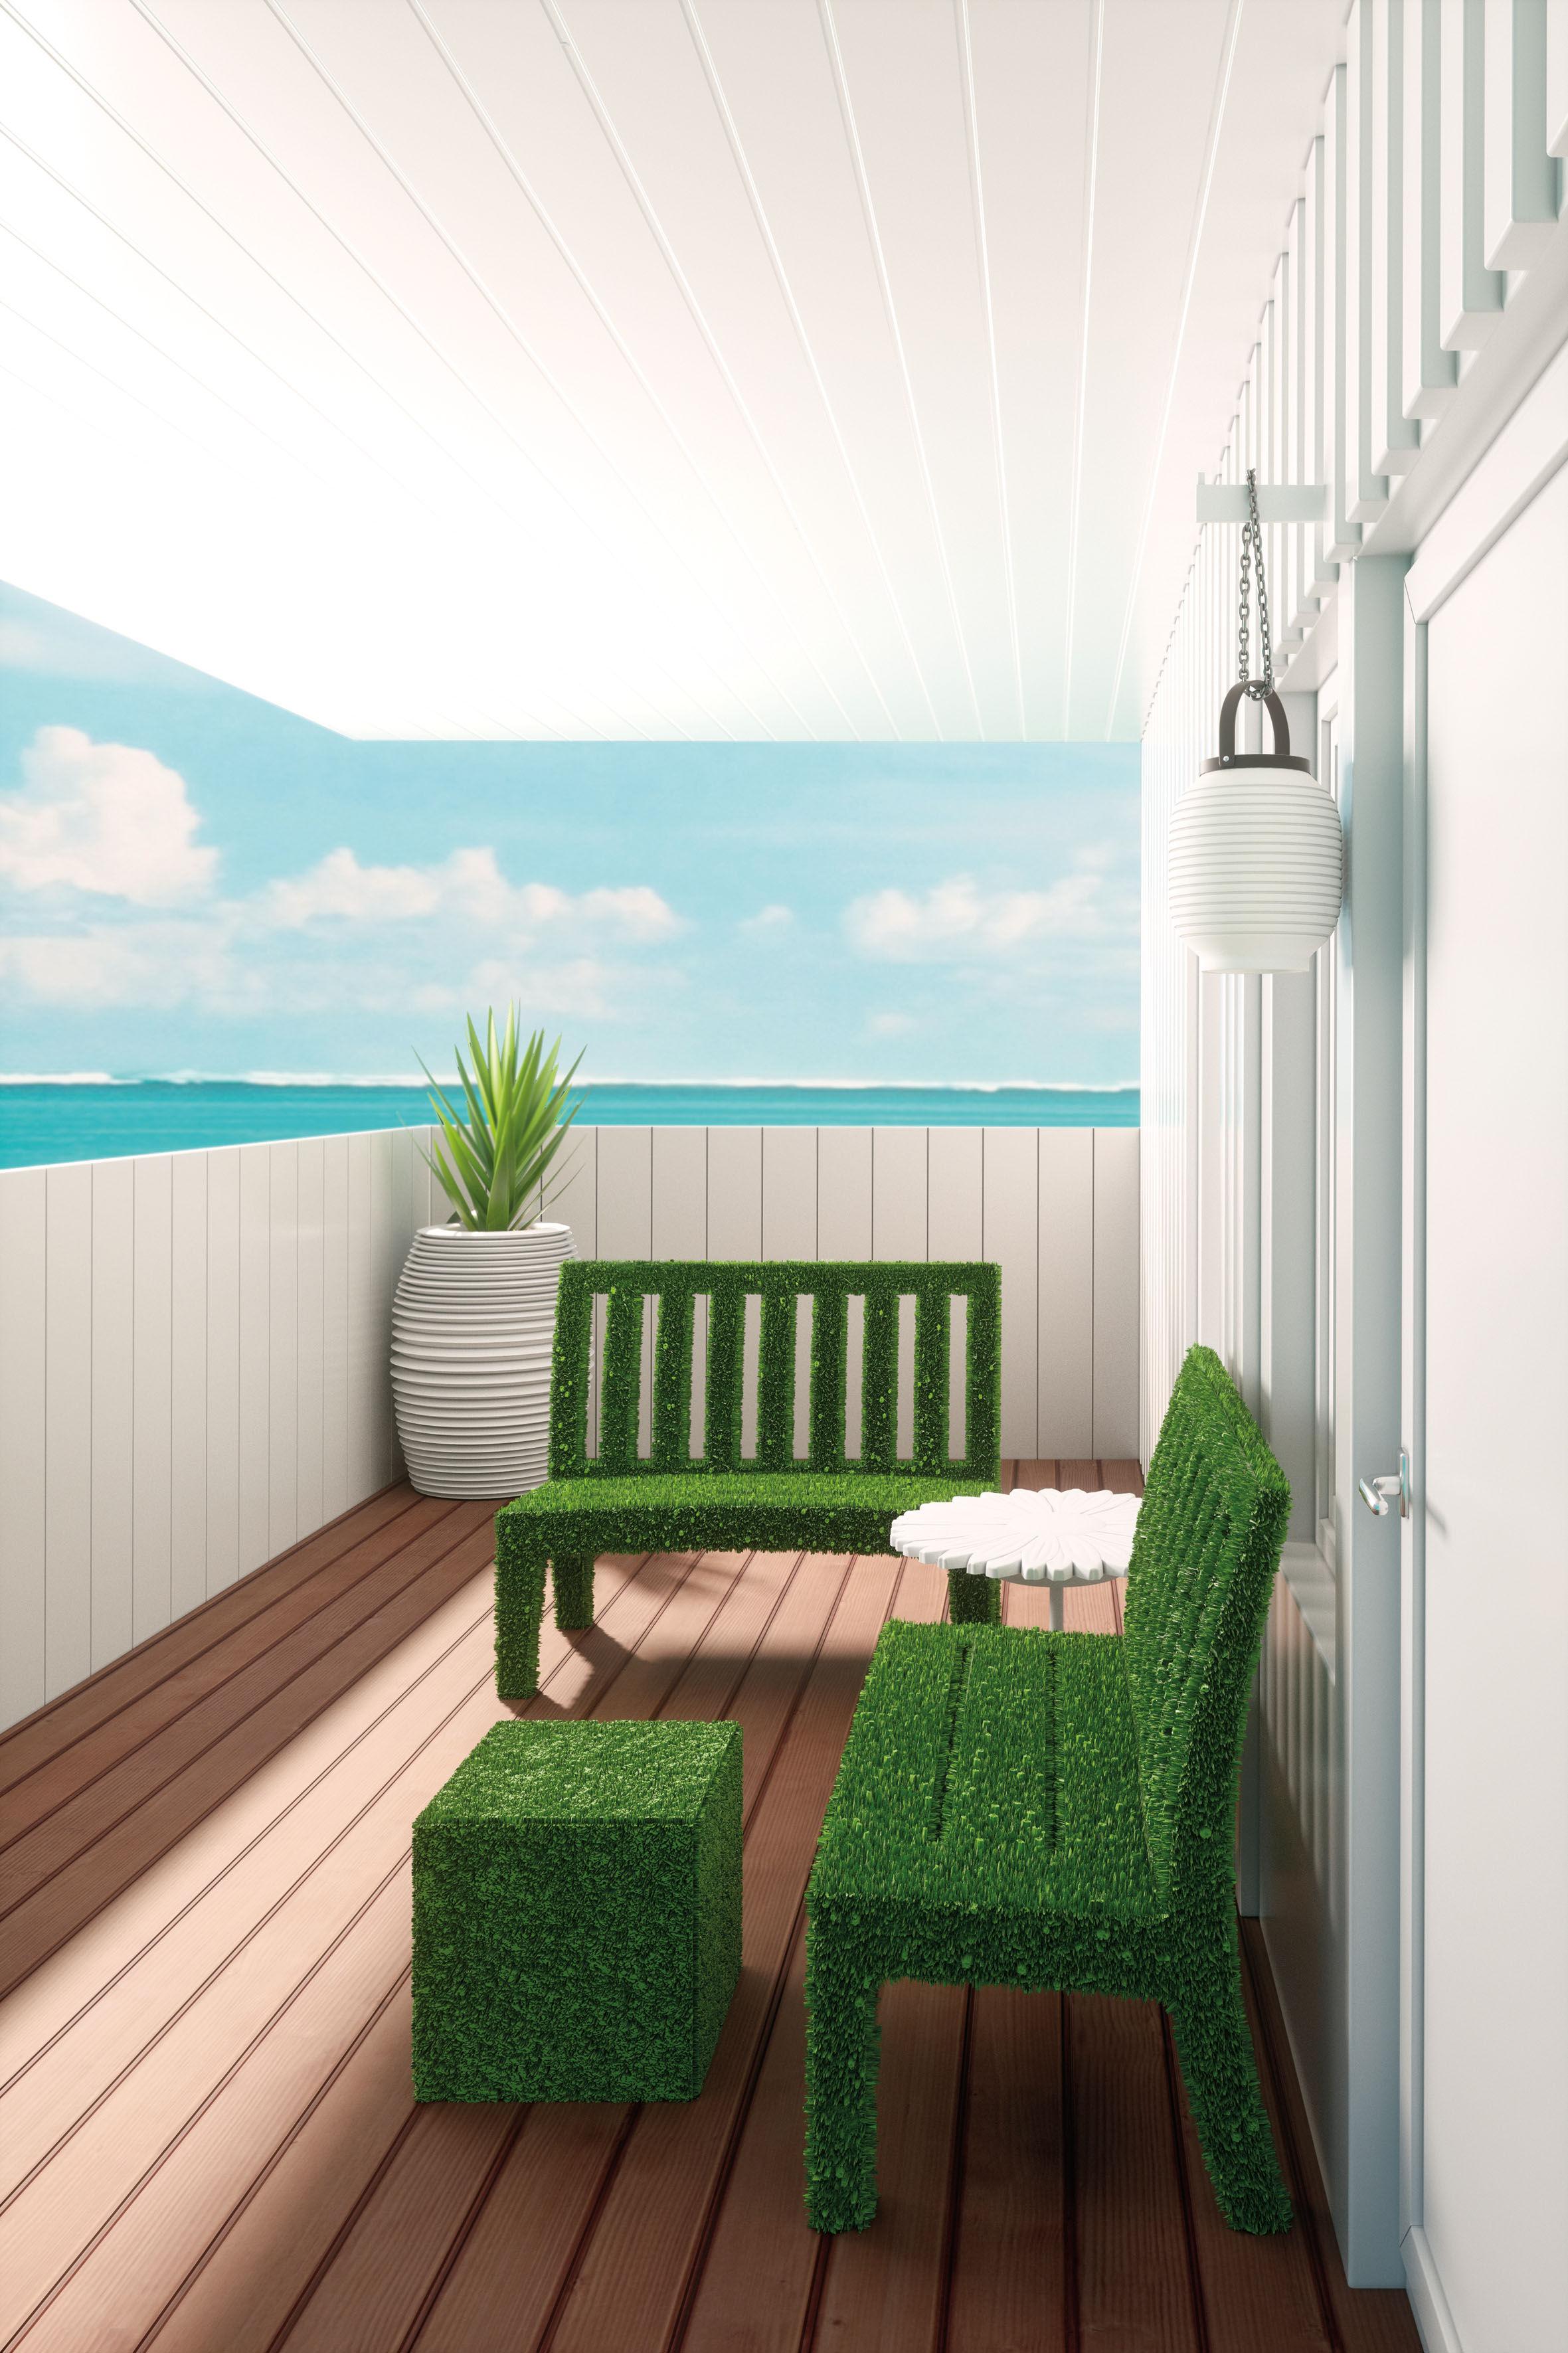 lampe ohne kabel honey von serralunga wei made in design. Black Bedroom Furniture Sets. Home Design Ideas